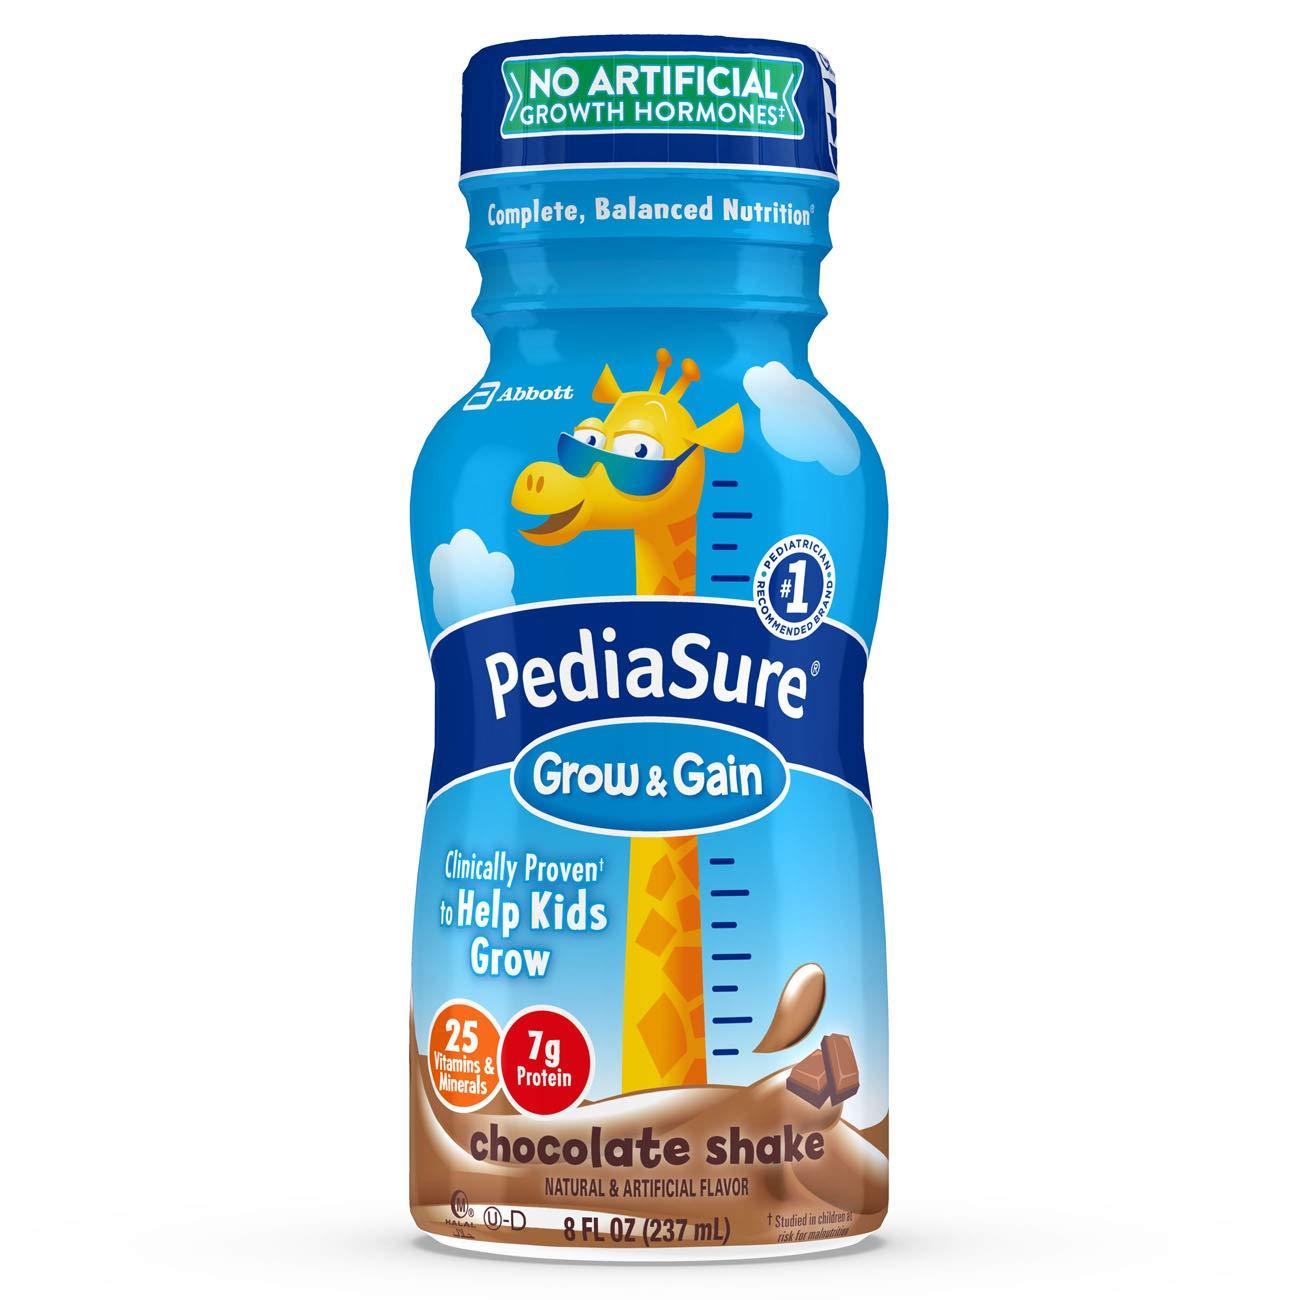 PediaSure Grow & Gain Nutrition Shake For Kids, Chocolate, 8 fl oz (Pack of 24)